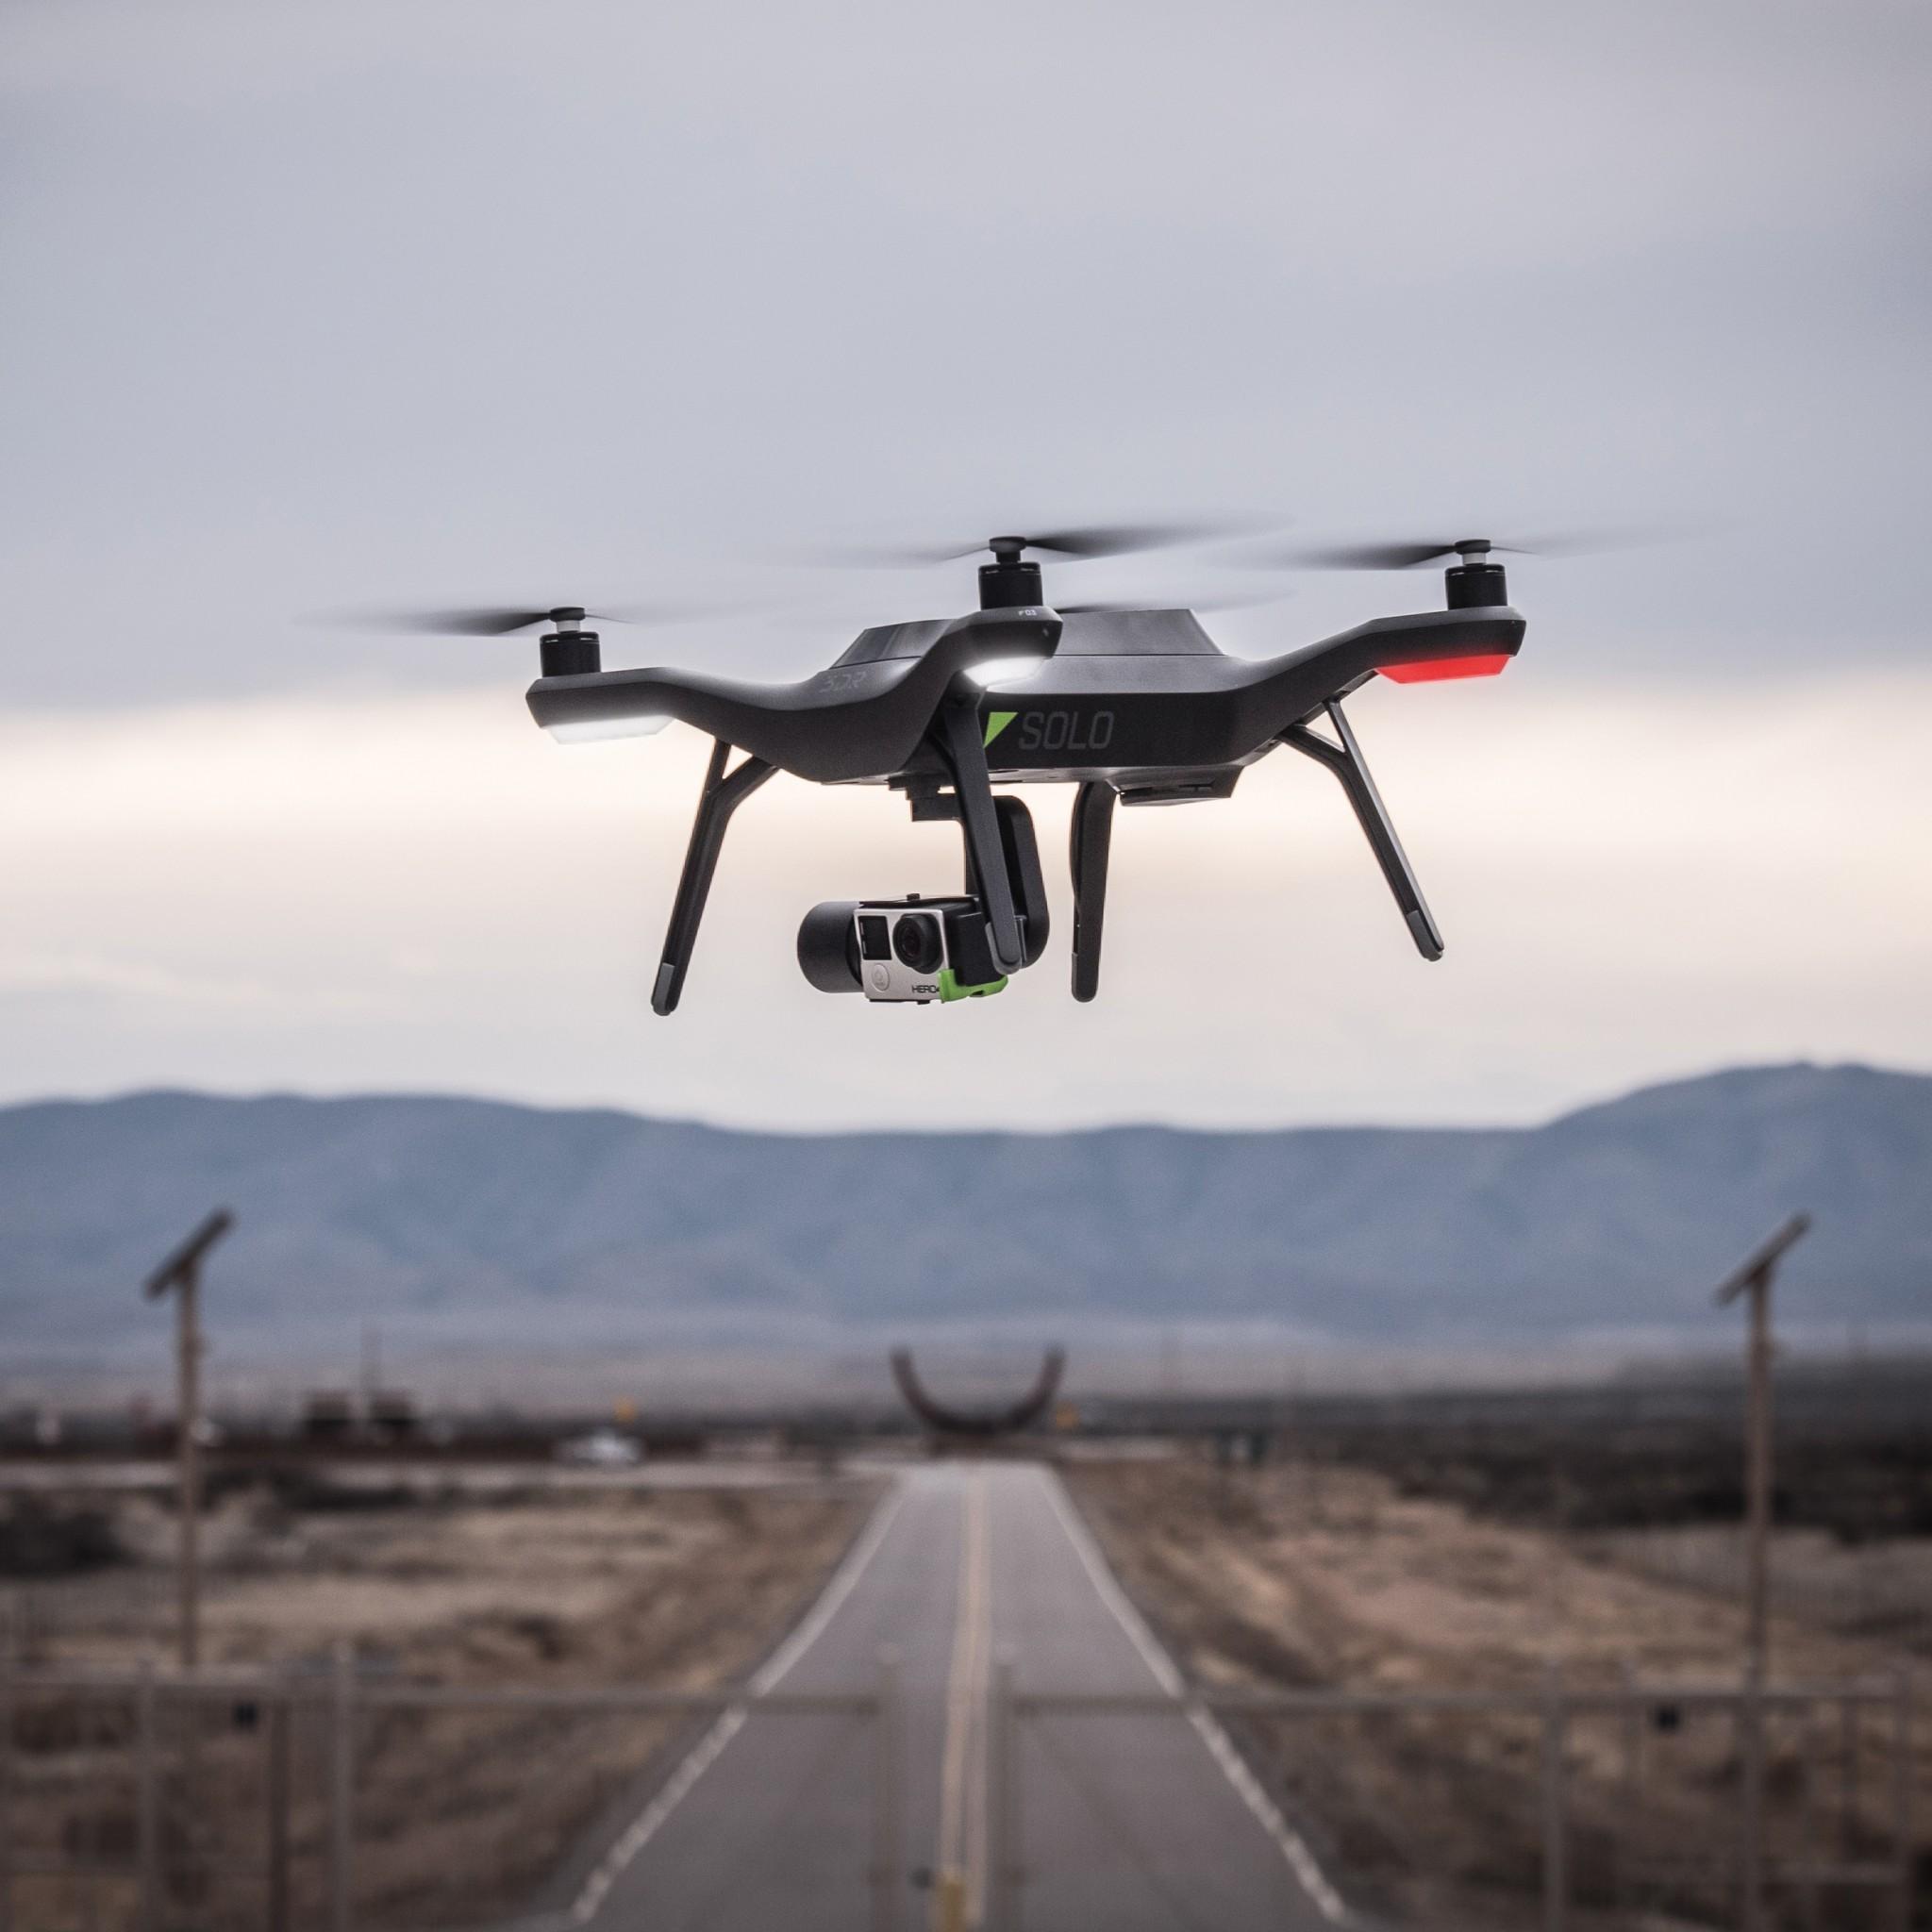 Dji Phantom 3 Drone Vs 3d Robotics Solo Drone Nerdwallet